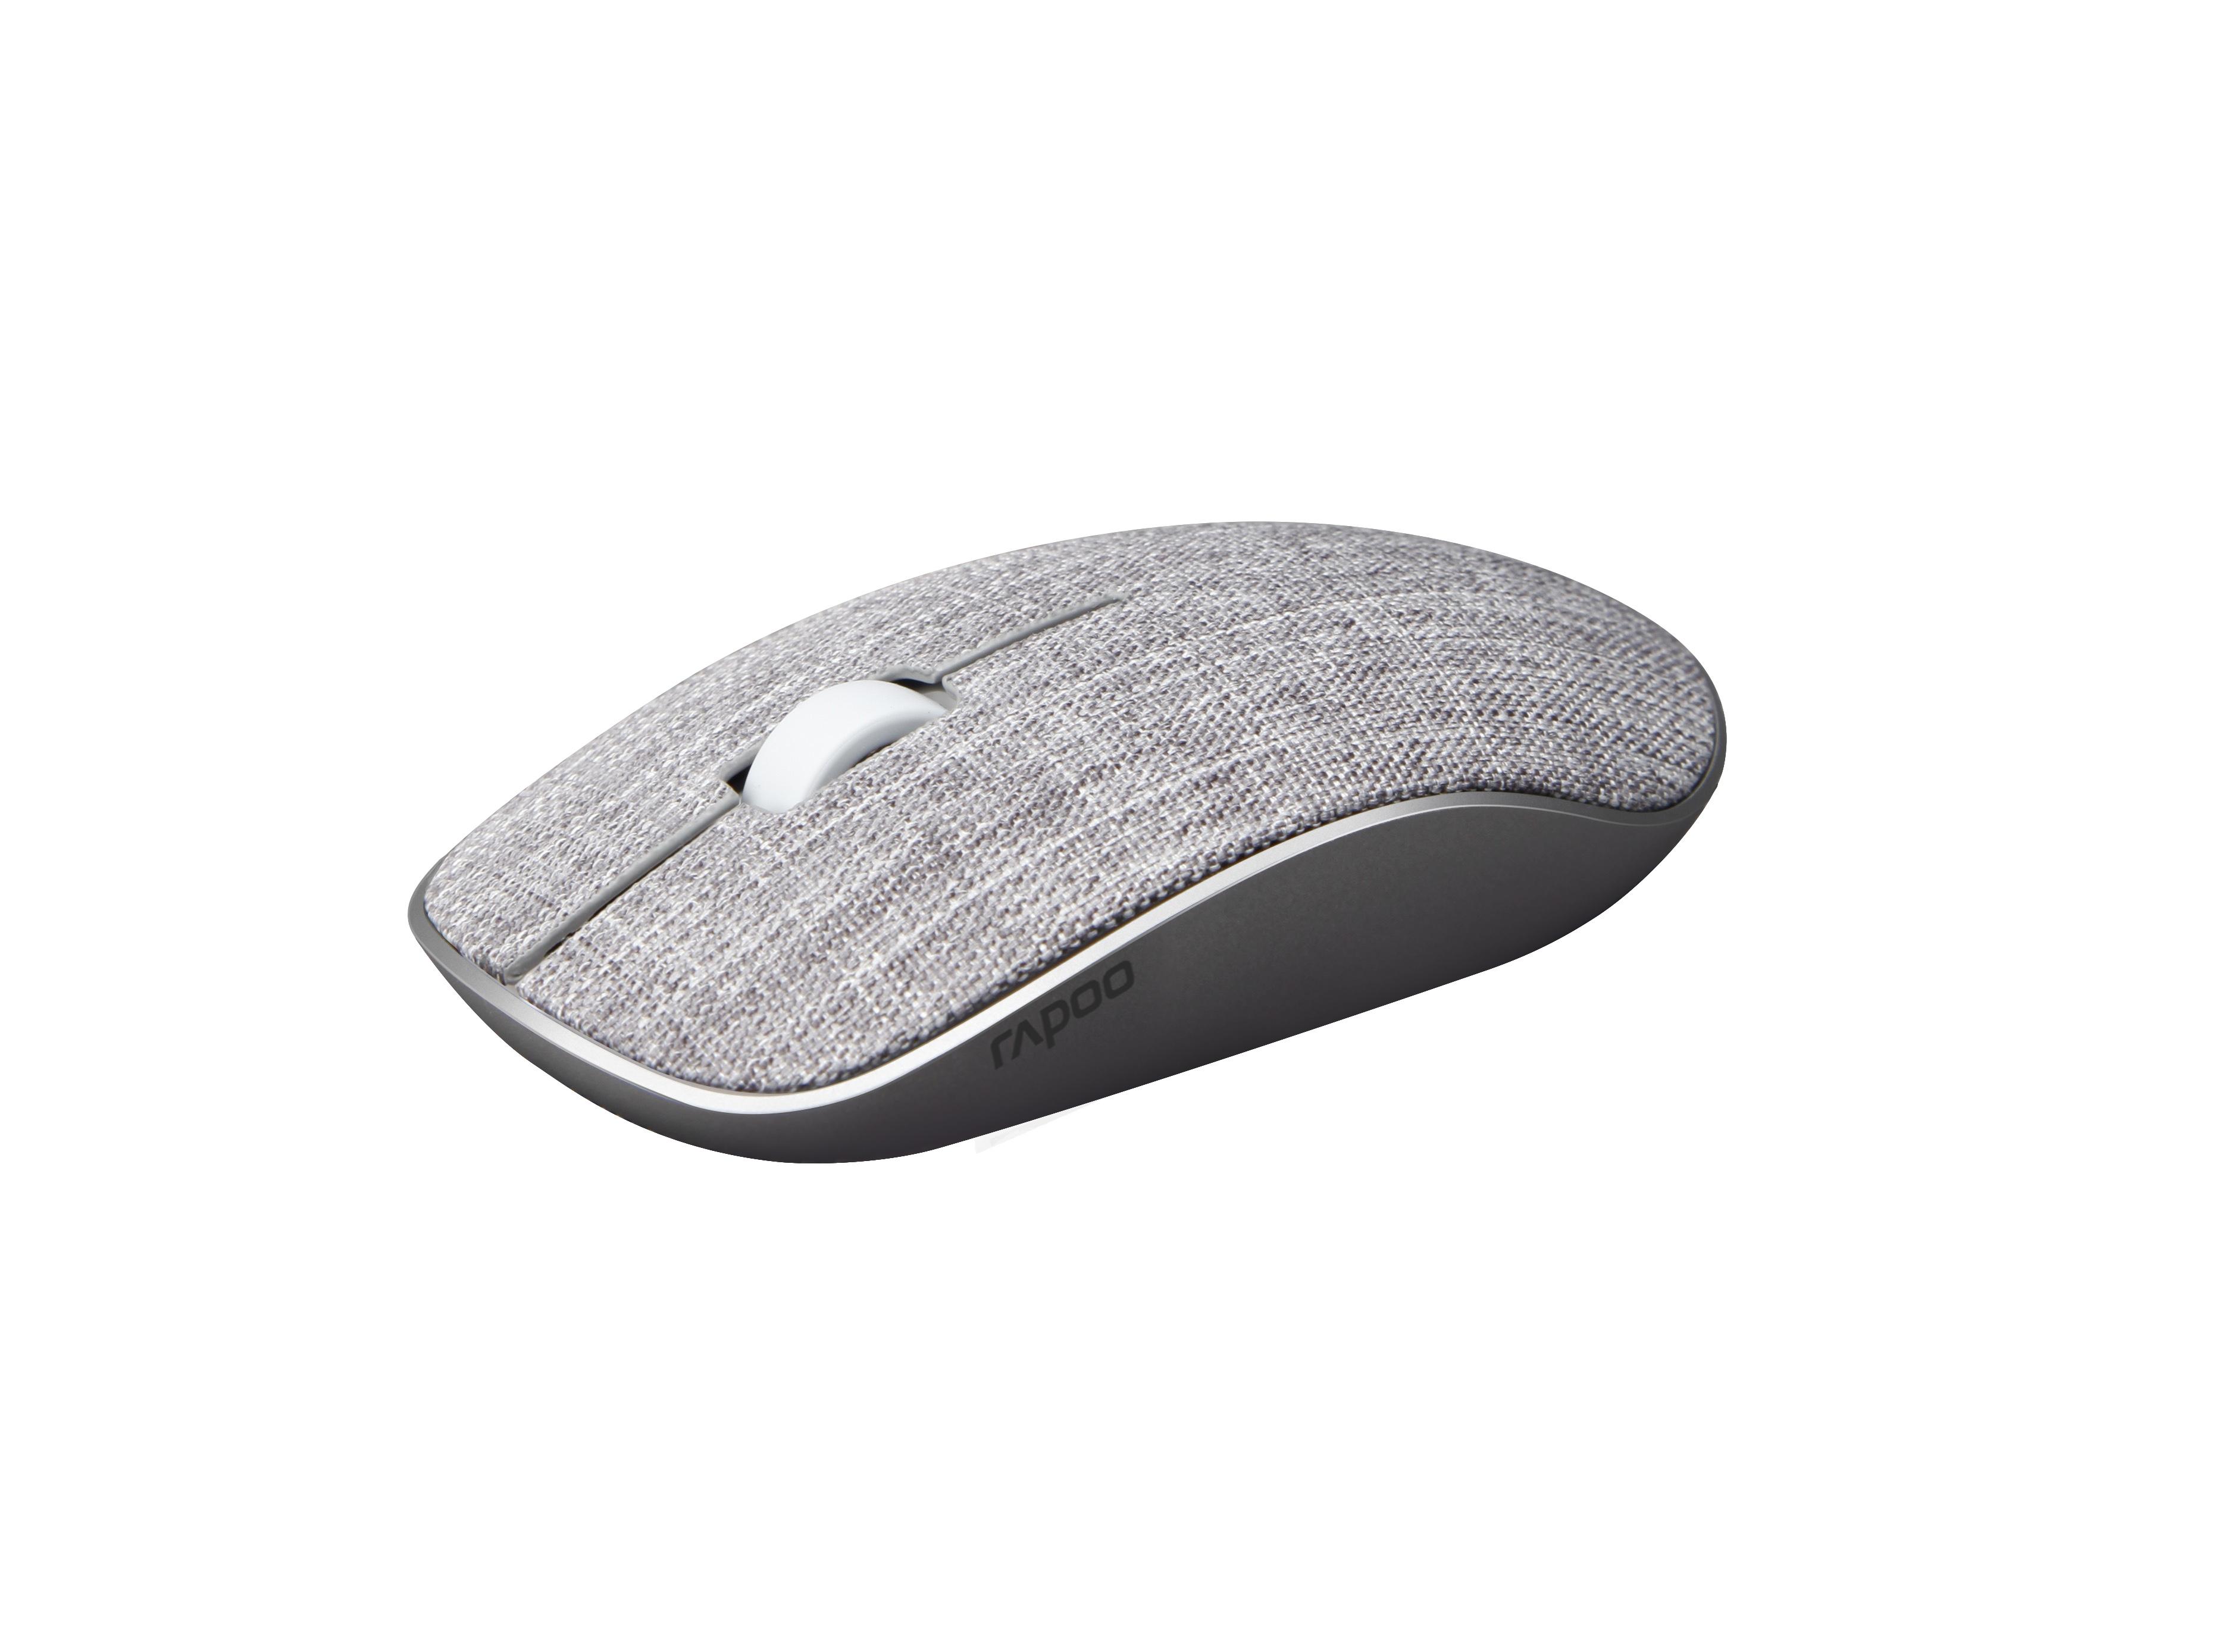 Rapoo Fabric 3510 Plus Grey Wireless Mouse